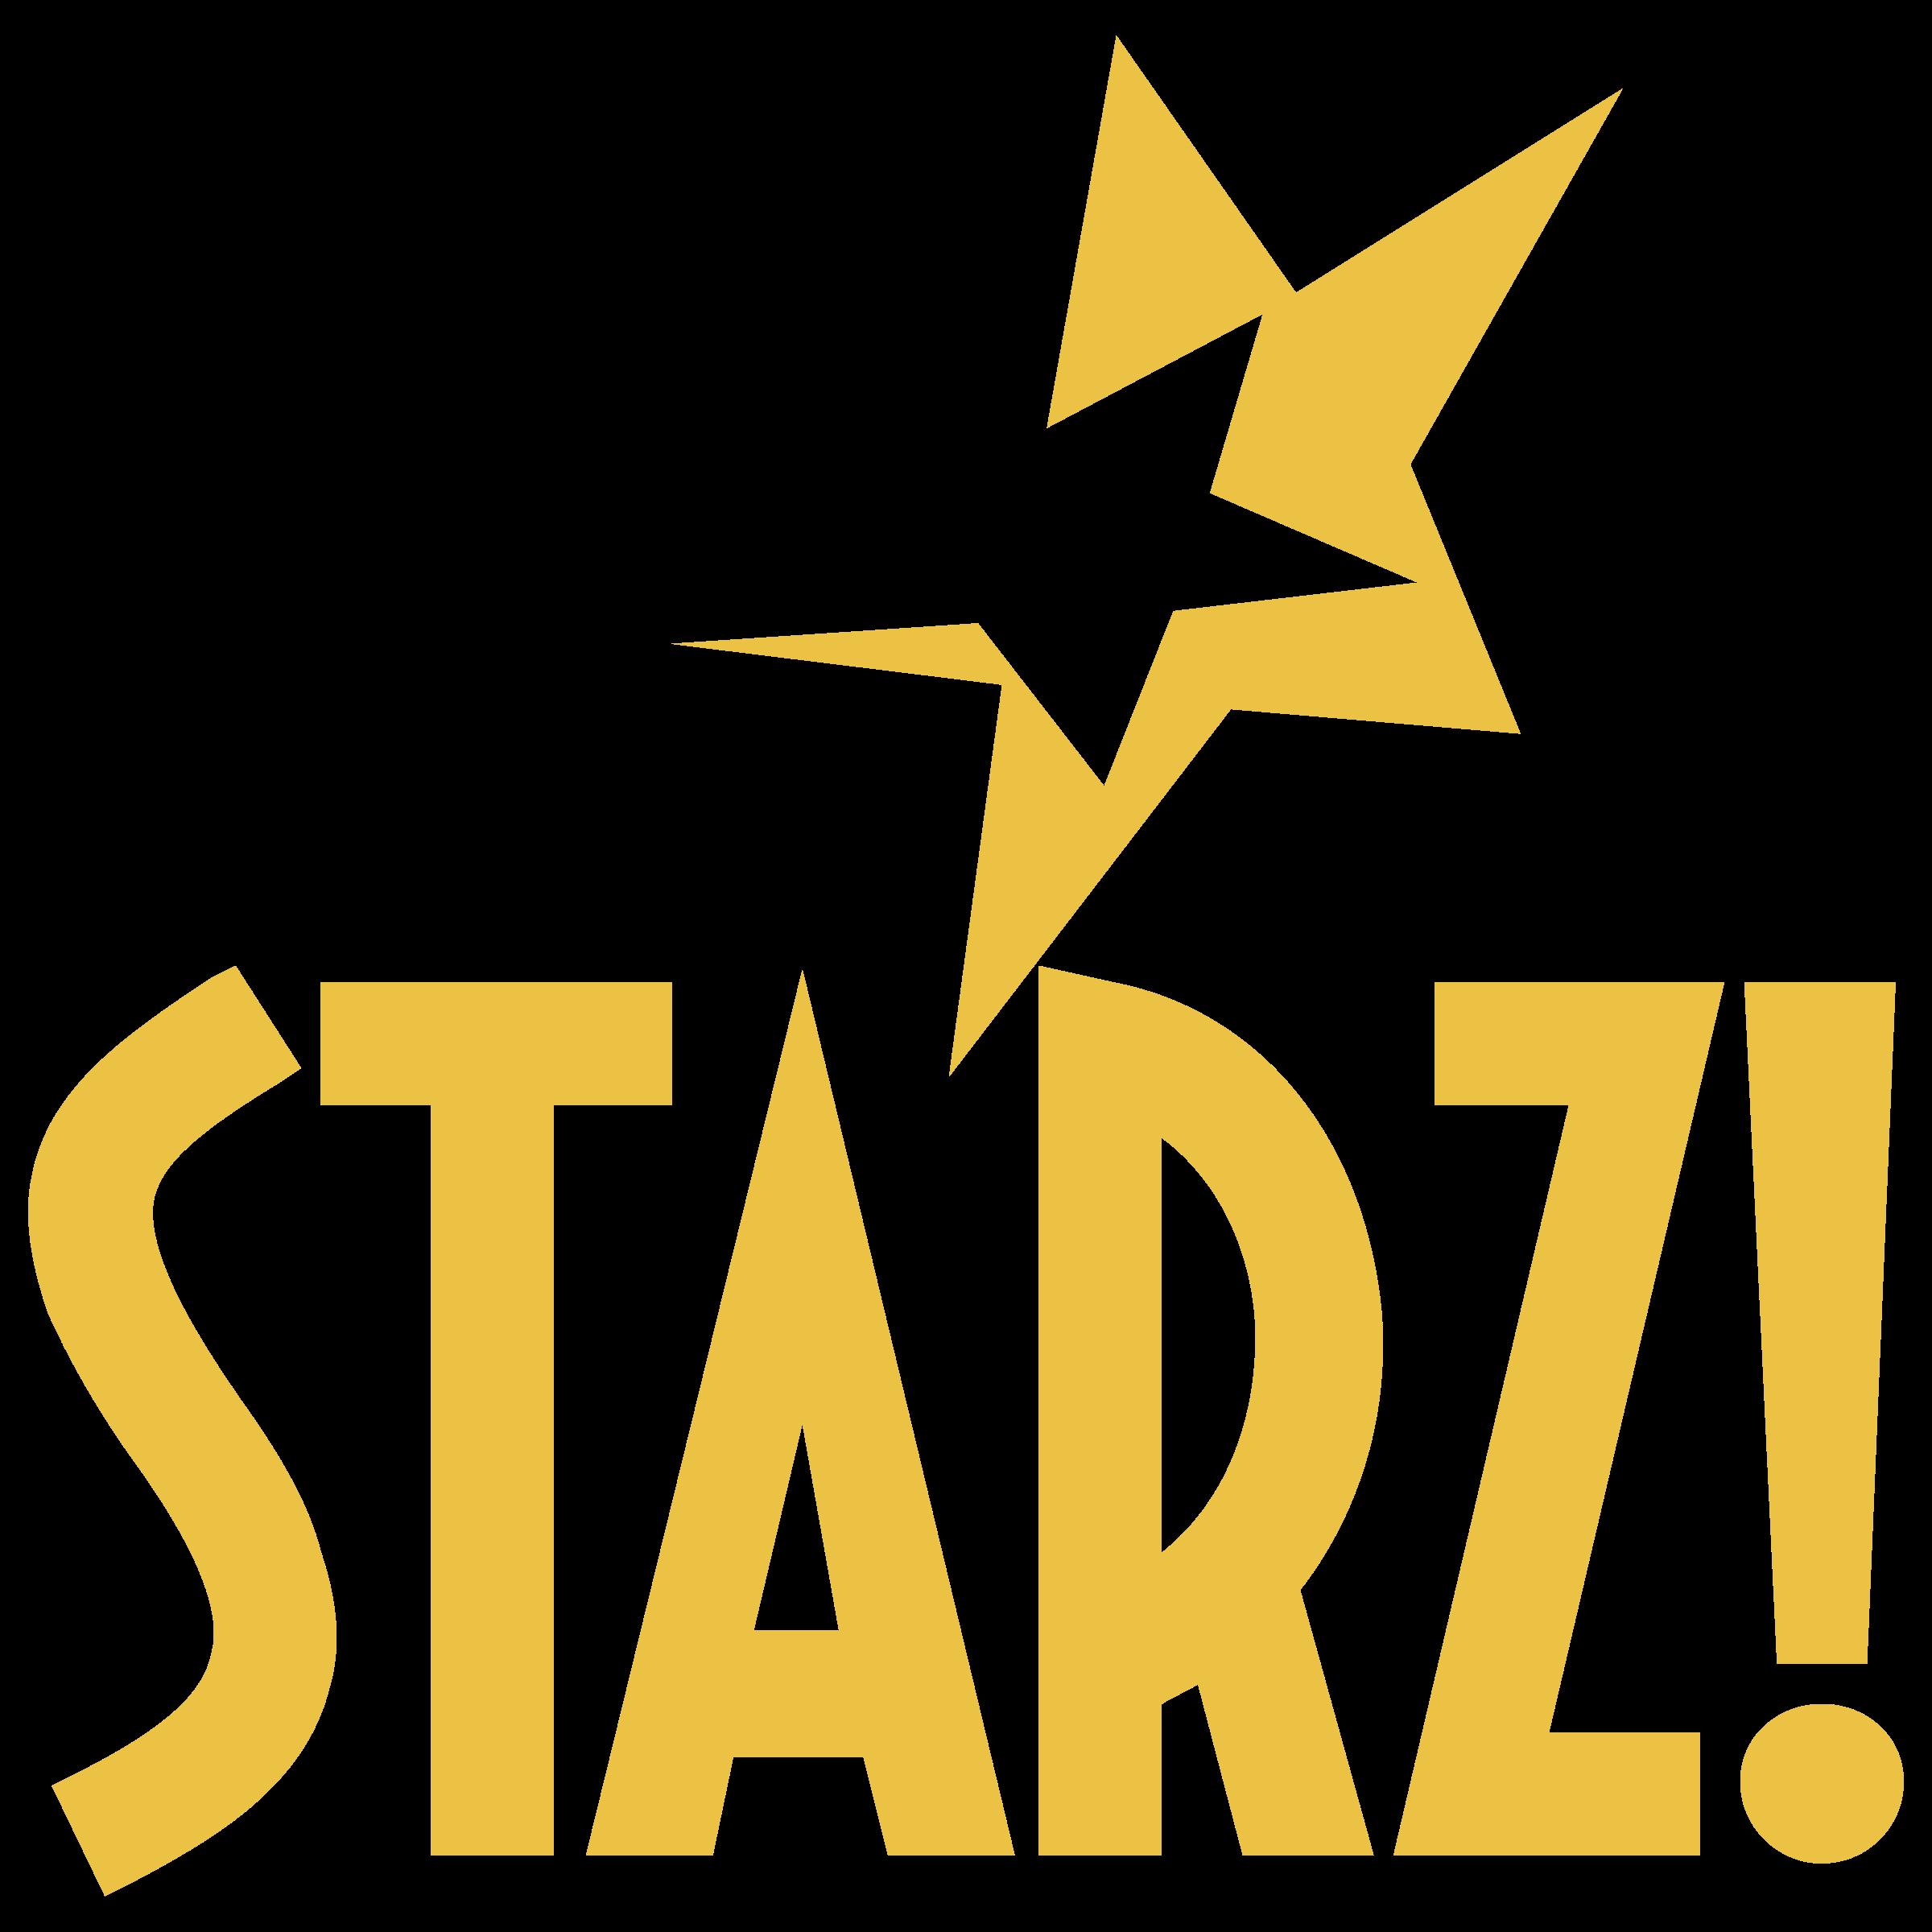 Starz! Logo PNG Transparent & SVG Vector.